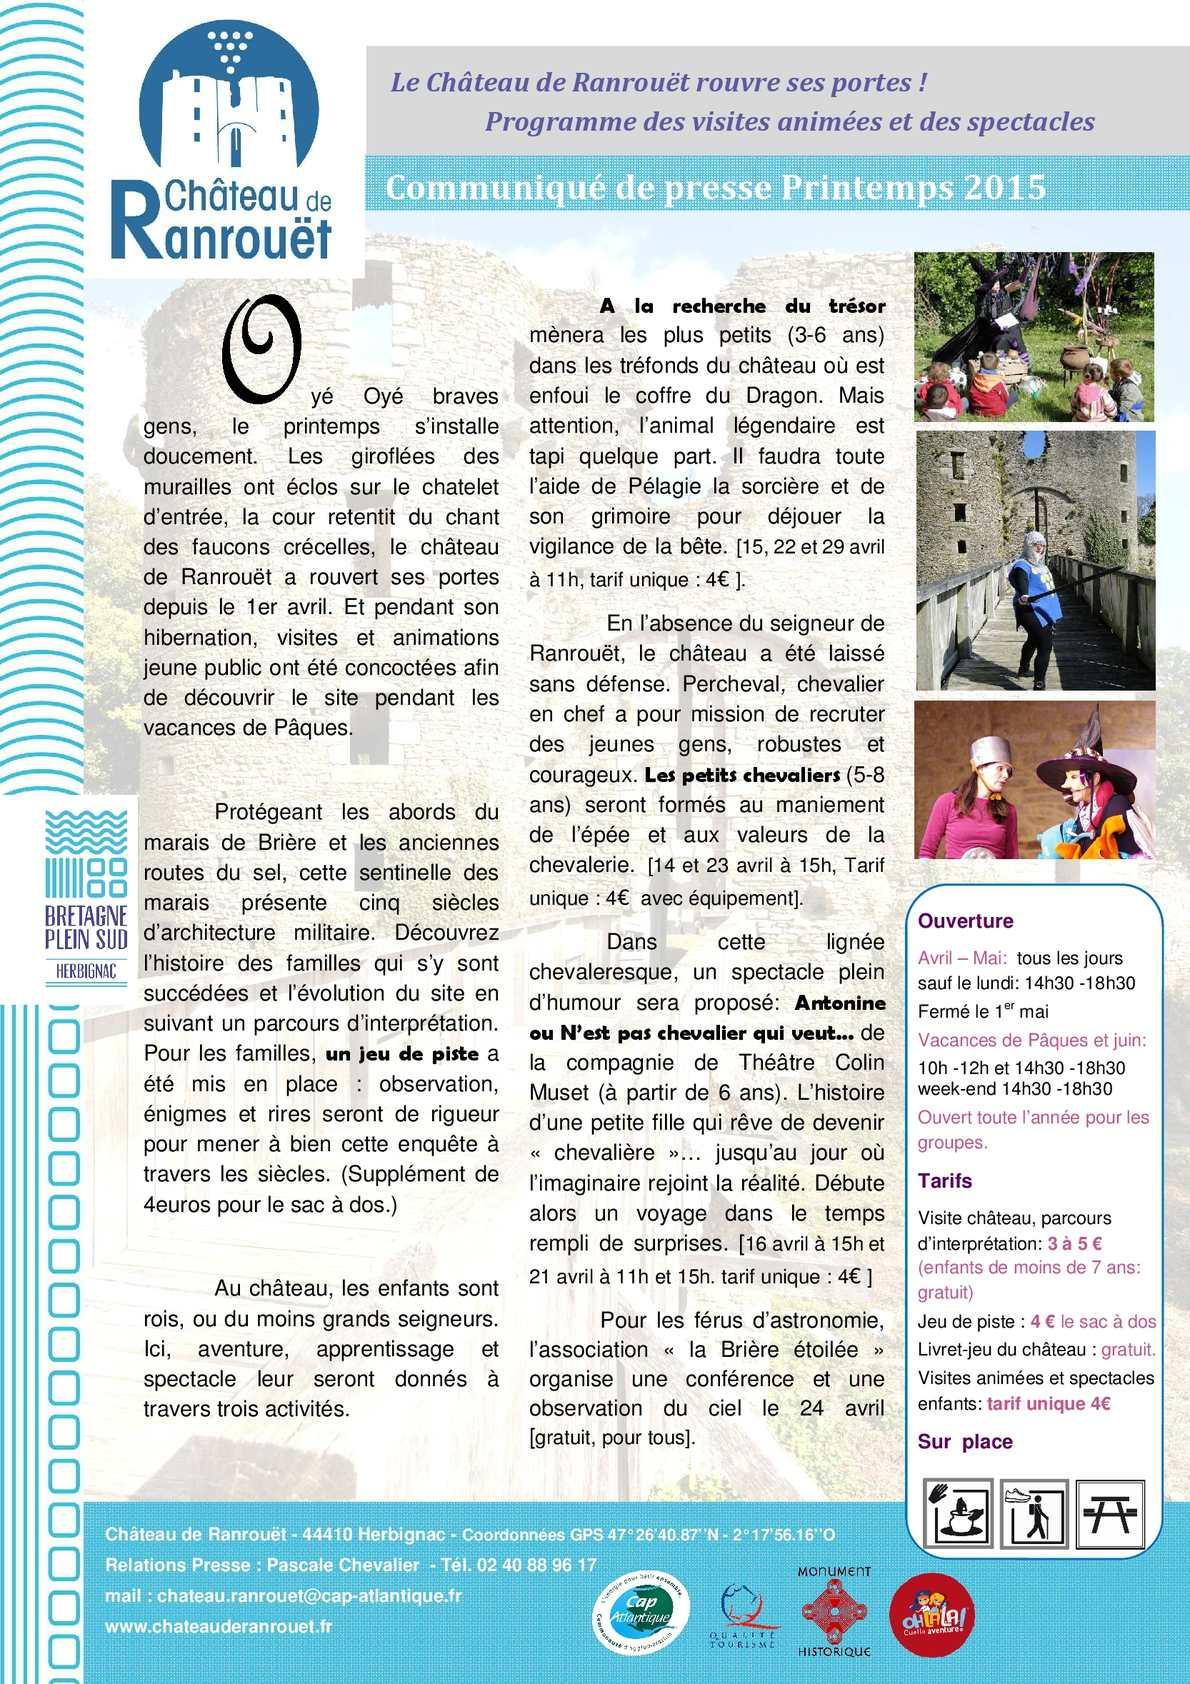 Calaméo - Cp Vacances De Pâques 2015 avec Pelagie La Sorciere